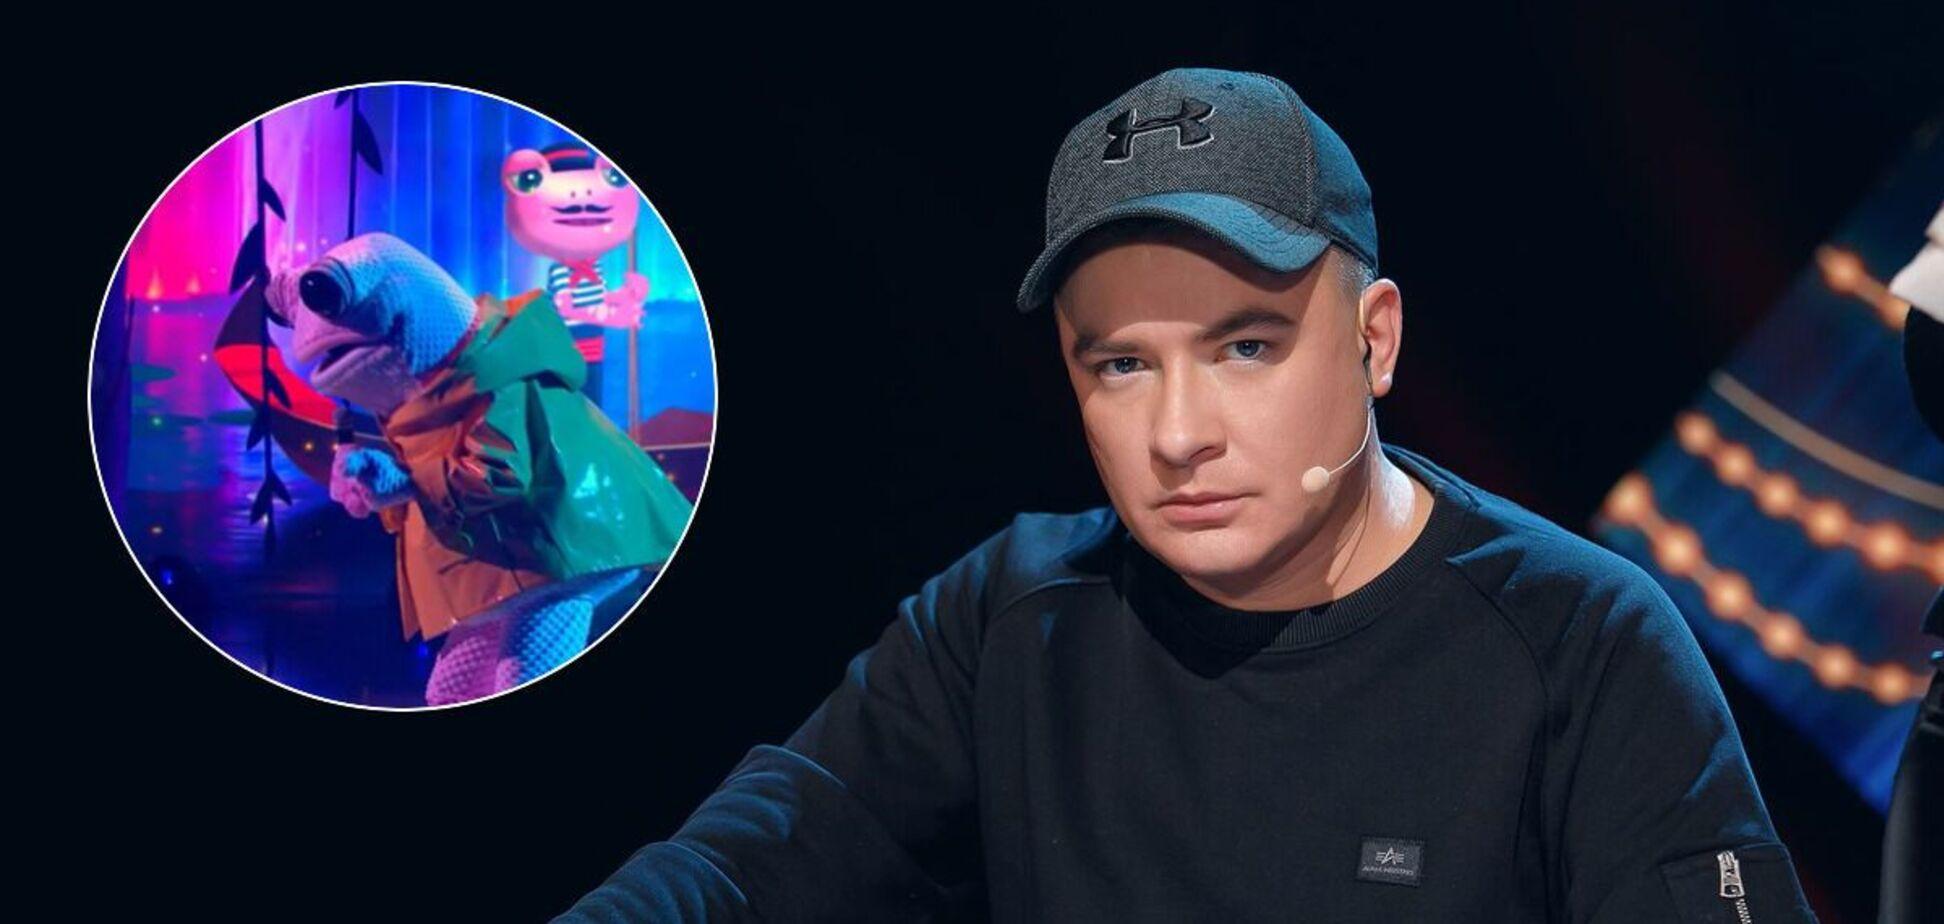 Андрей Данилко стал судьей шоу 'Маска'